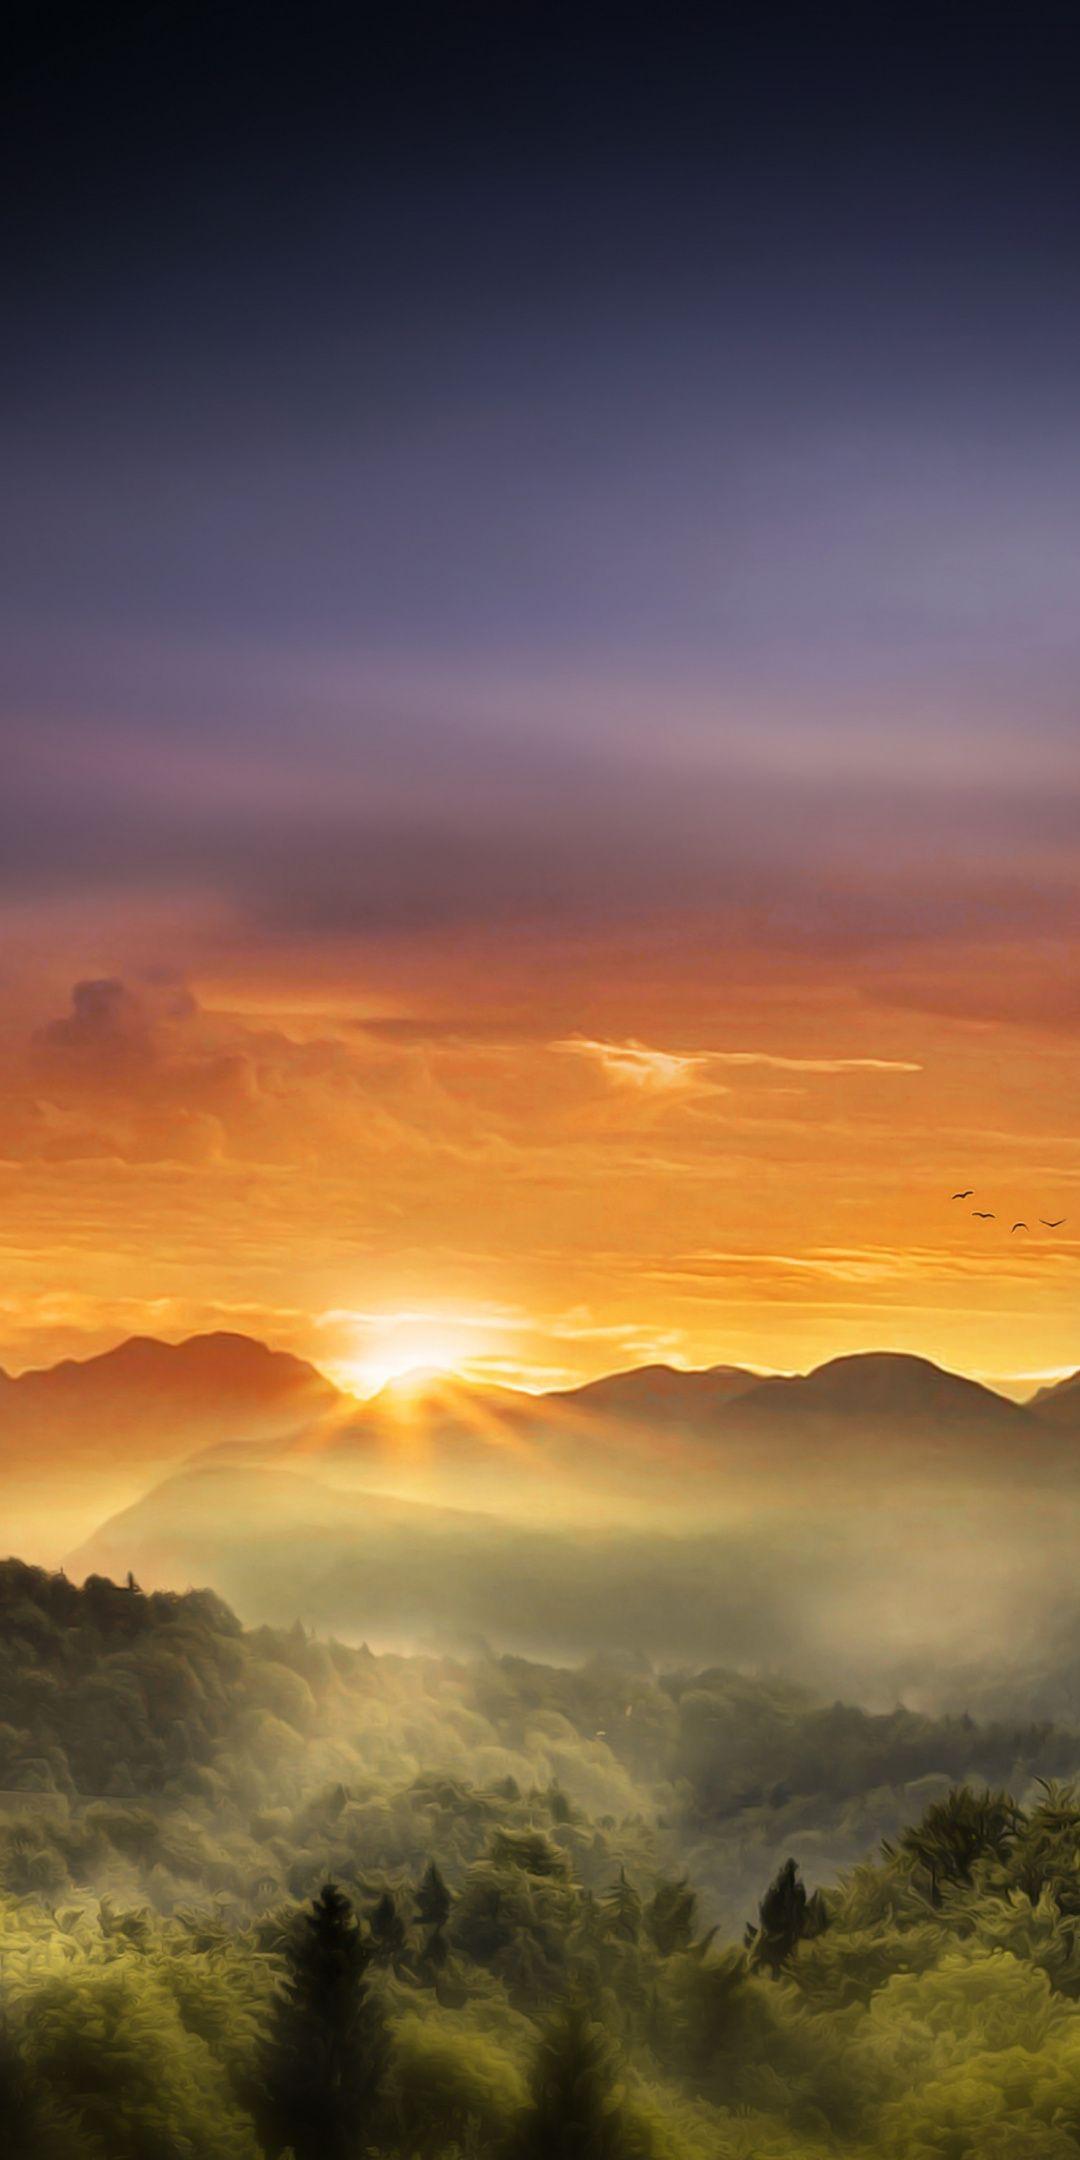 Horizon Sunrise Mountains Nature 1080x2160 Wallpaper Sunrises Nature Sunrise Wallpaper Beautiful Photos Of Nature